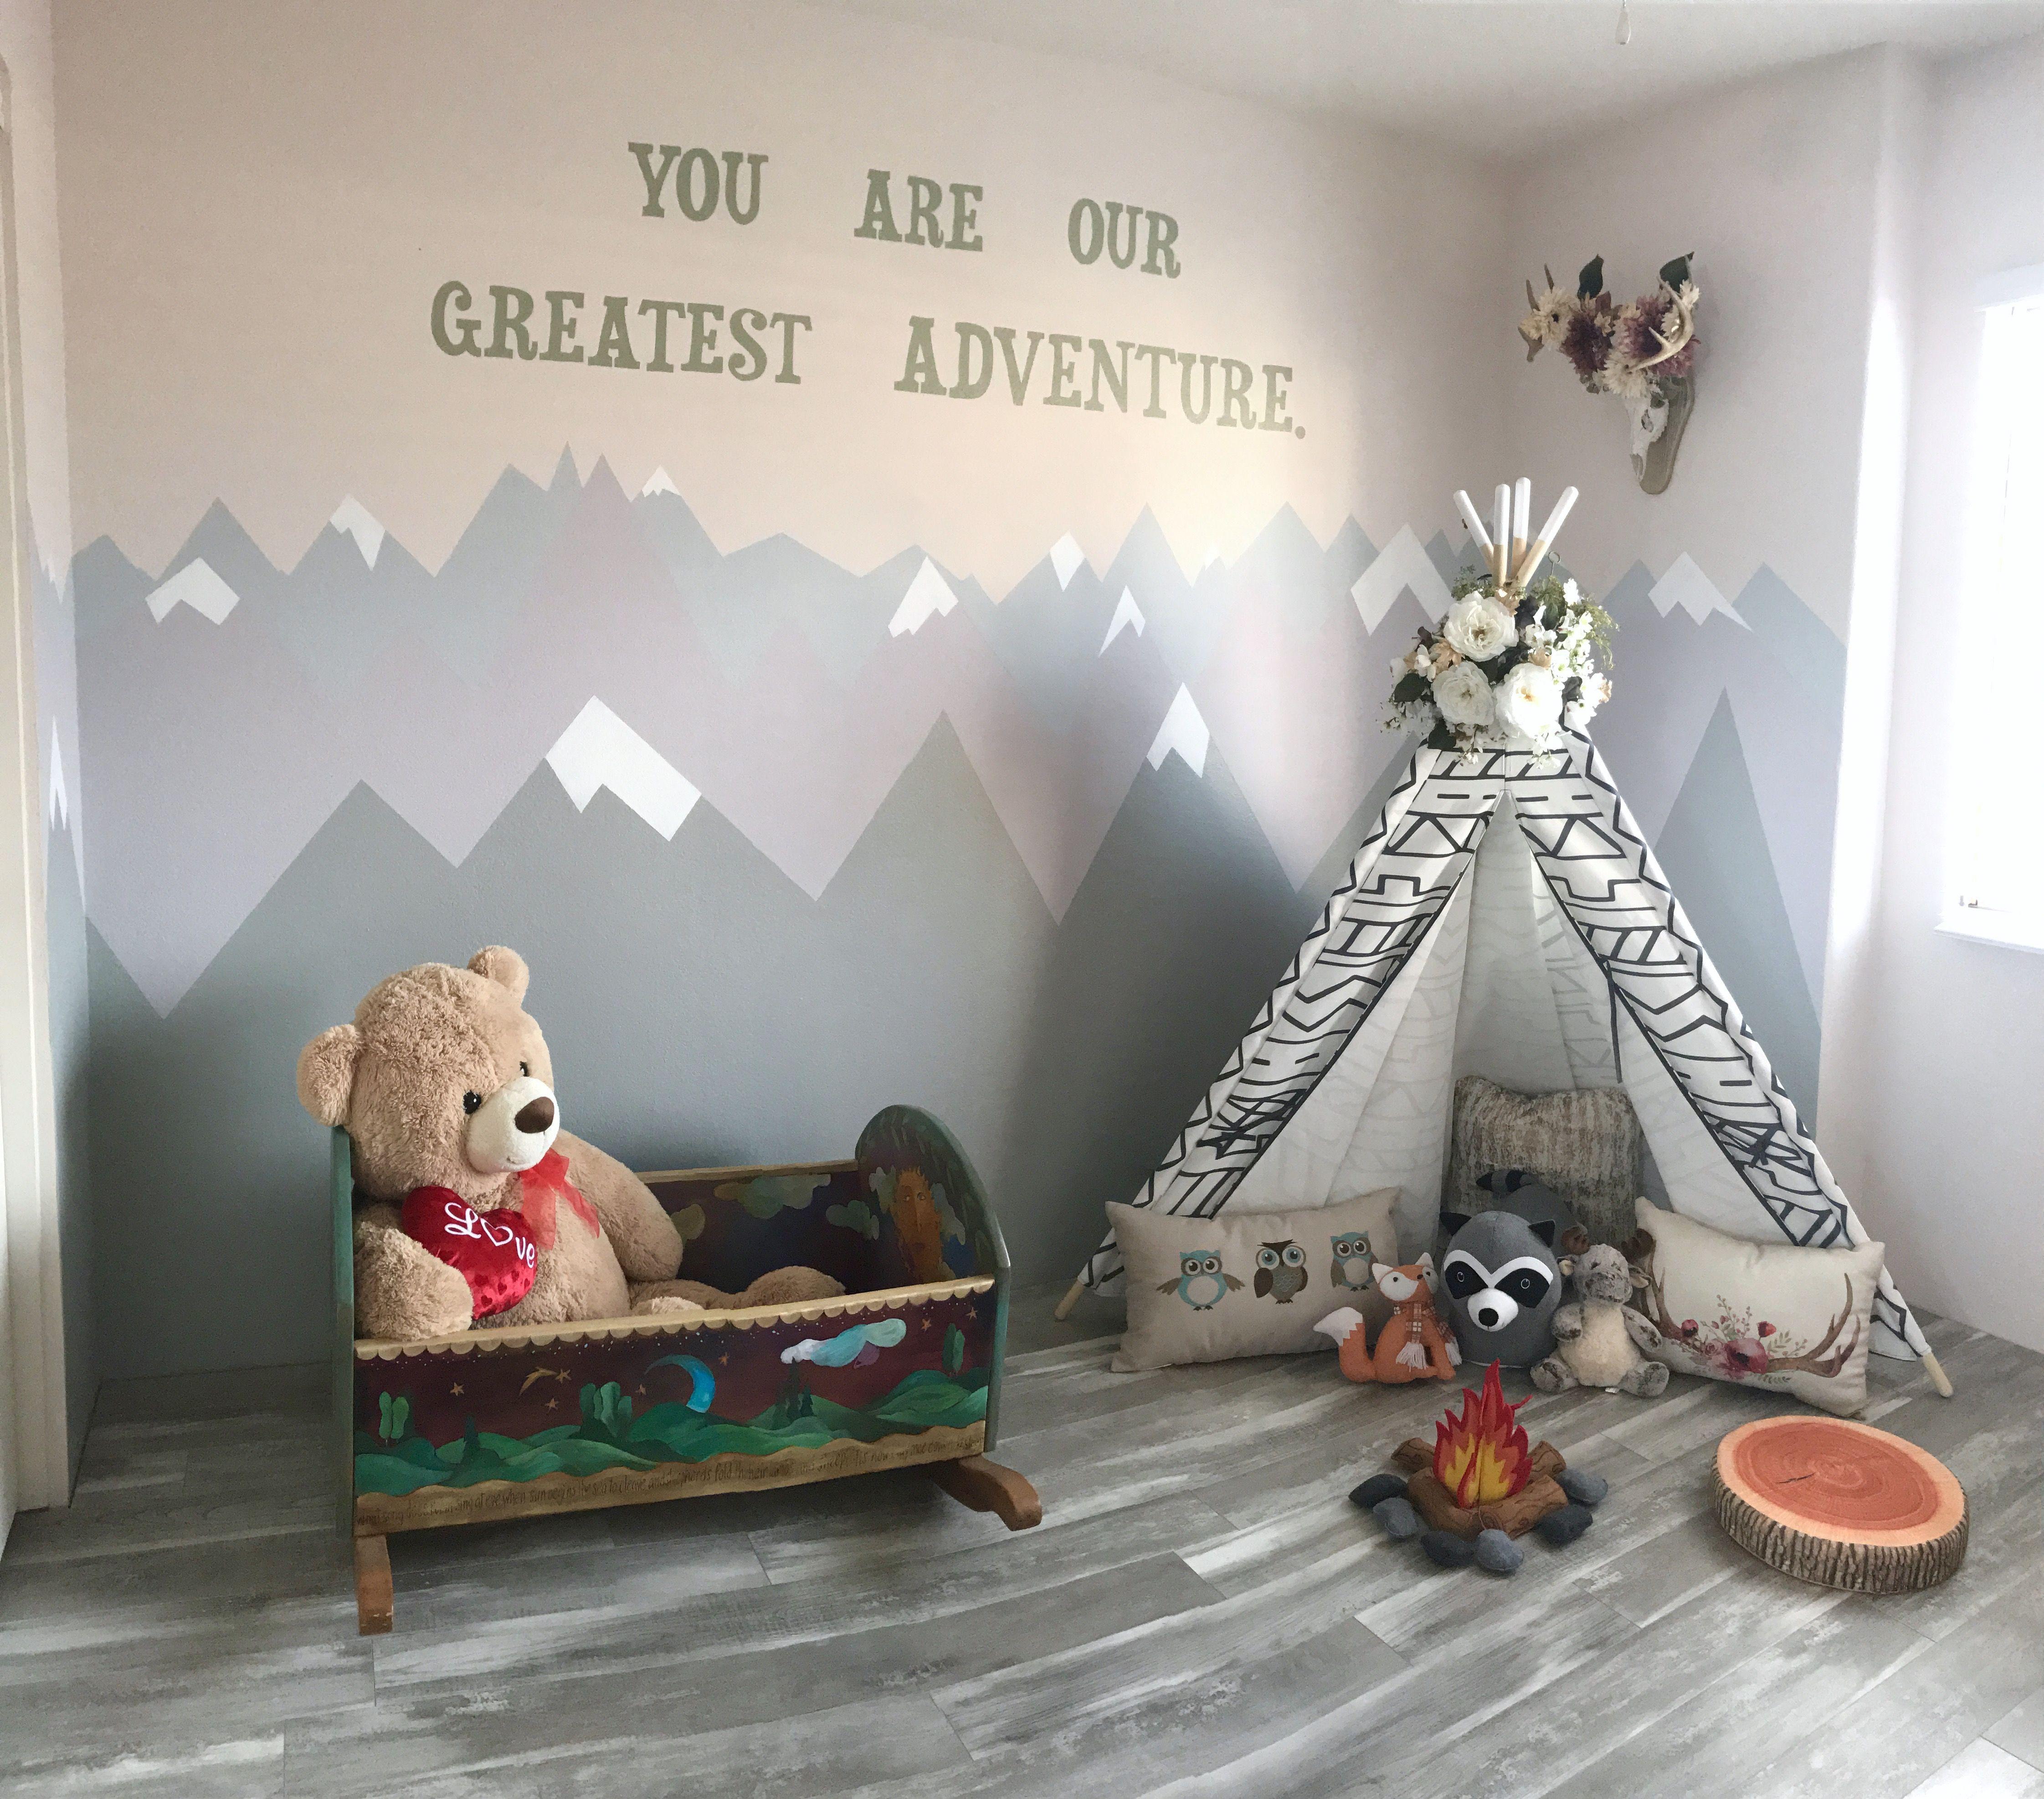 Woodland Tribal Playroom Theme With Teepee And Mountain Walls Mountain Walls Teepee Tribal